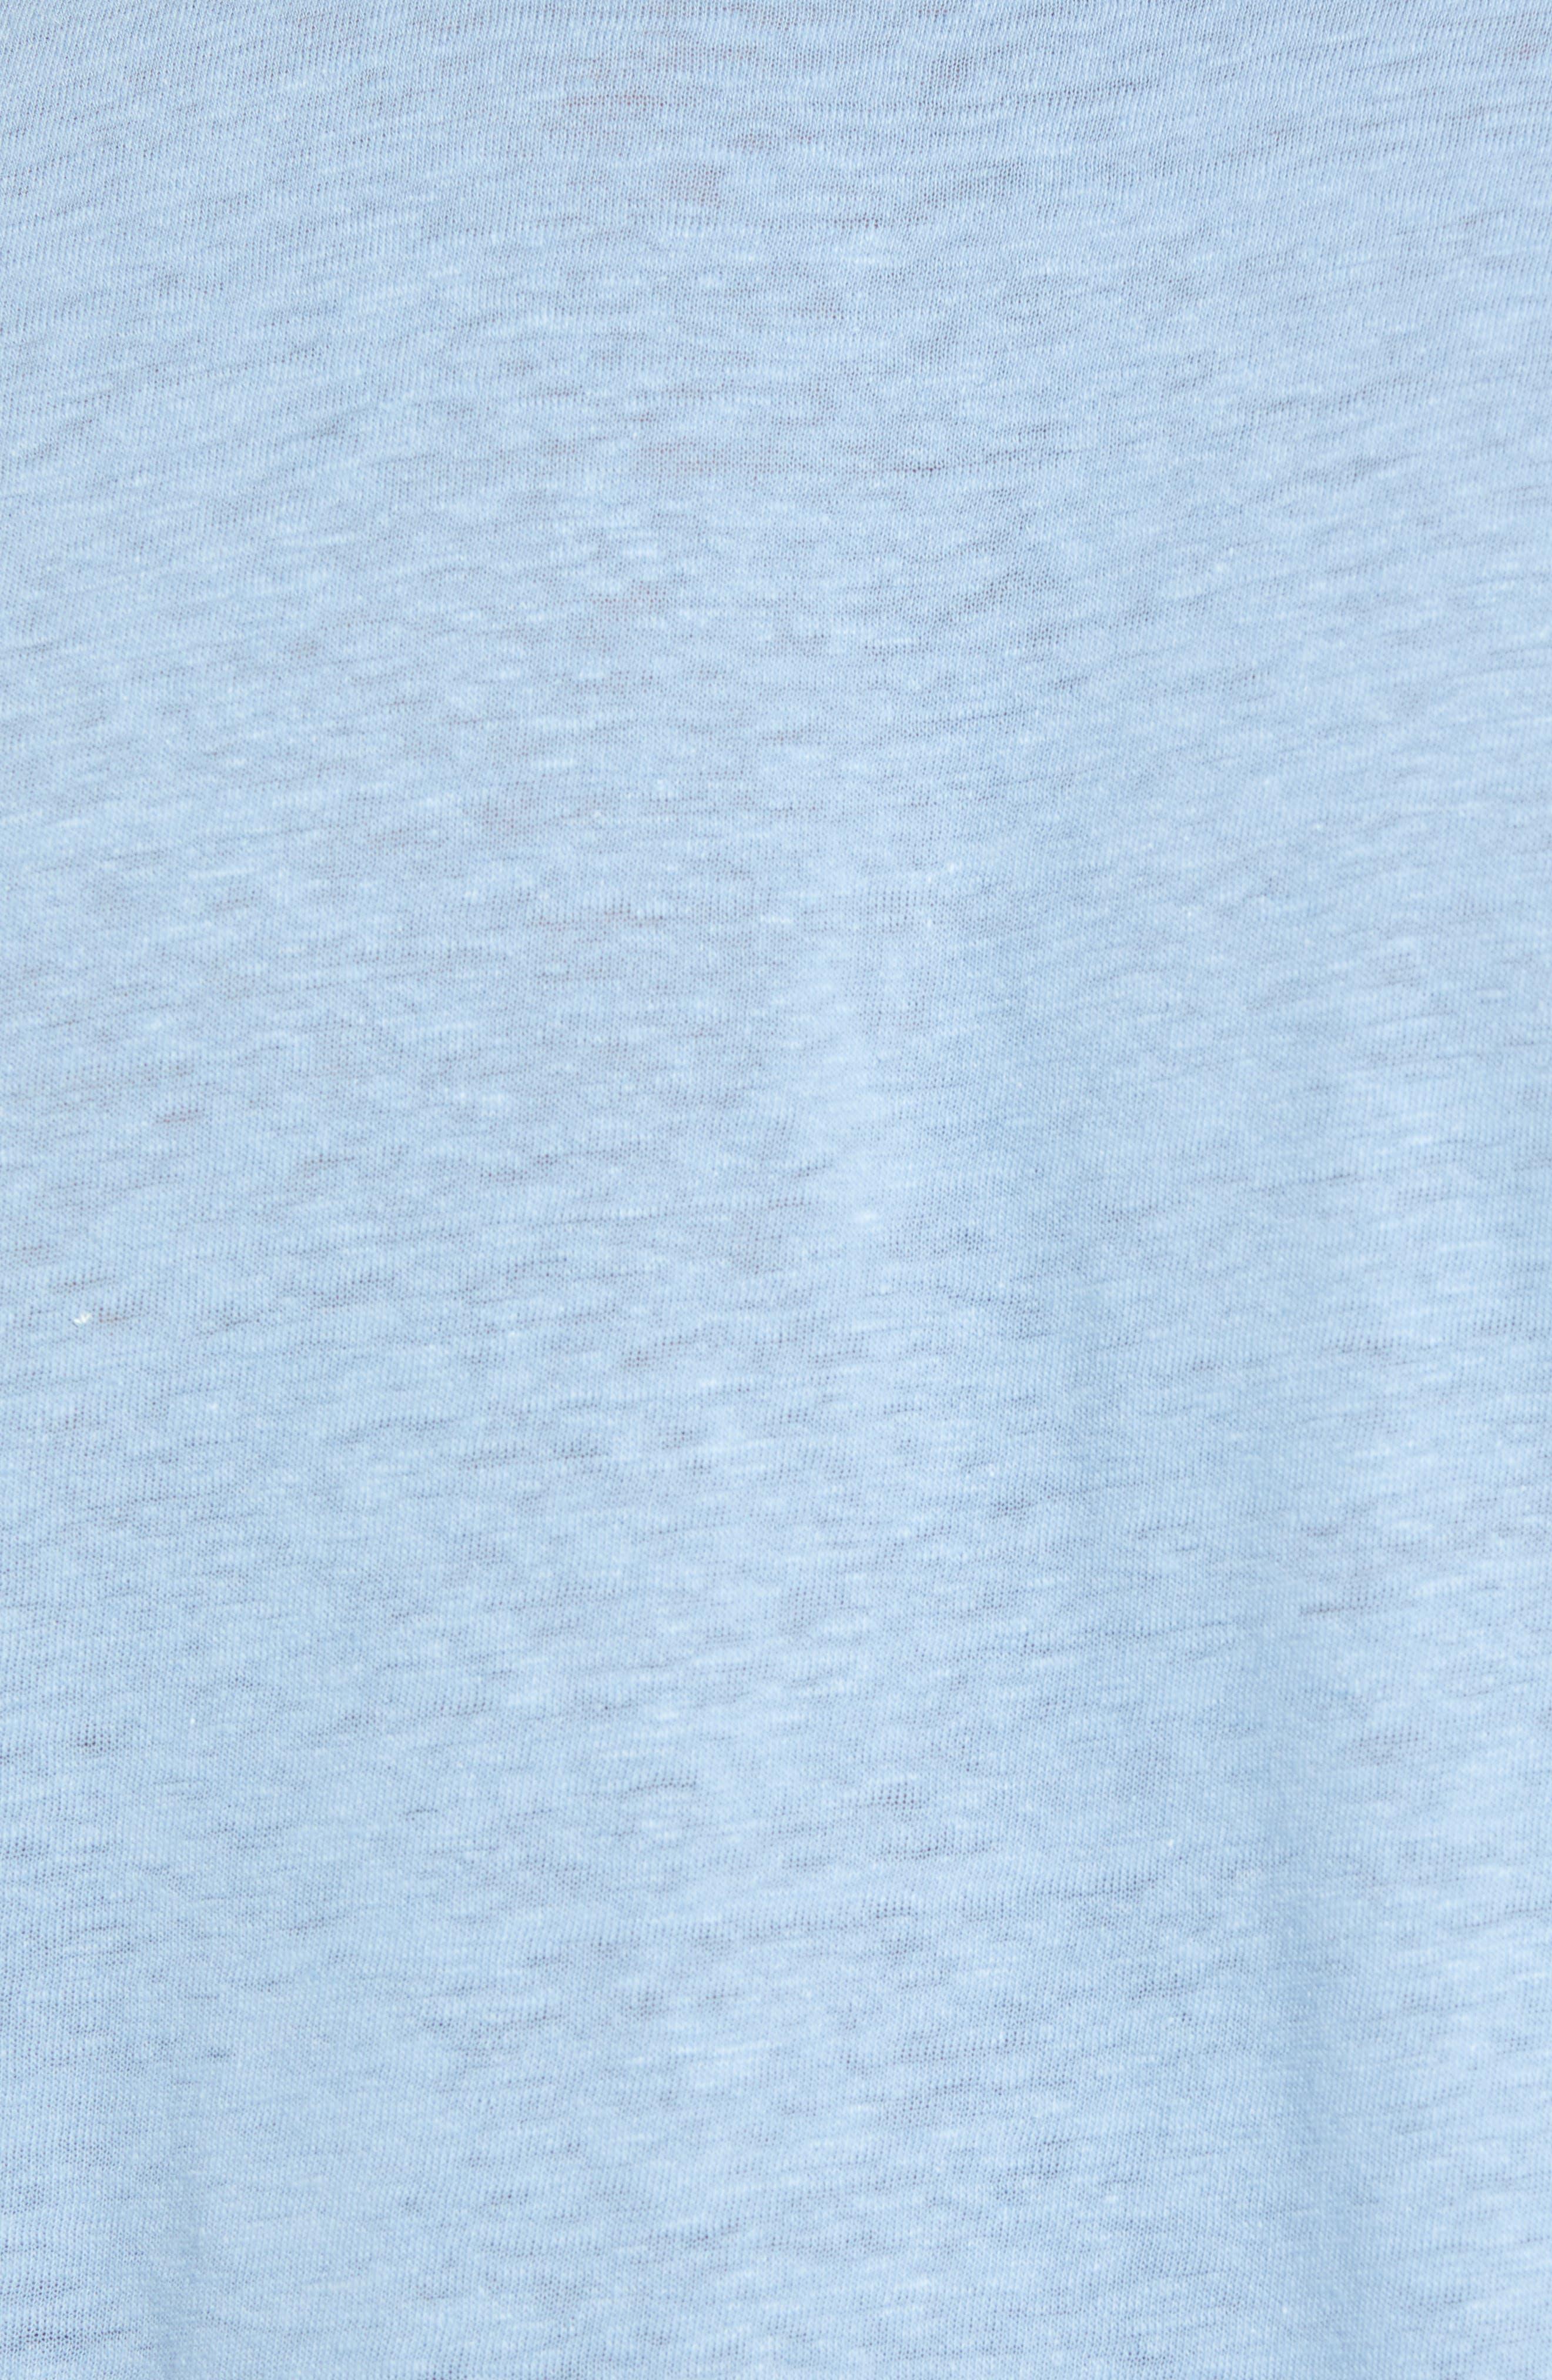 Slim Fit Polo,                             Alternate thumbnail 5, color,                             Ballard Blue